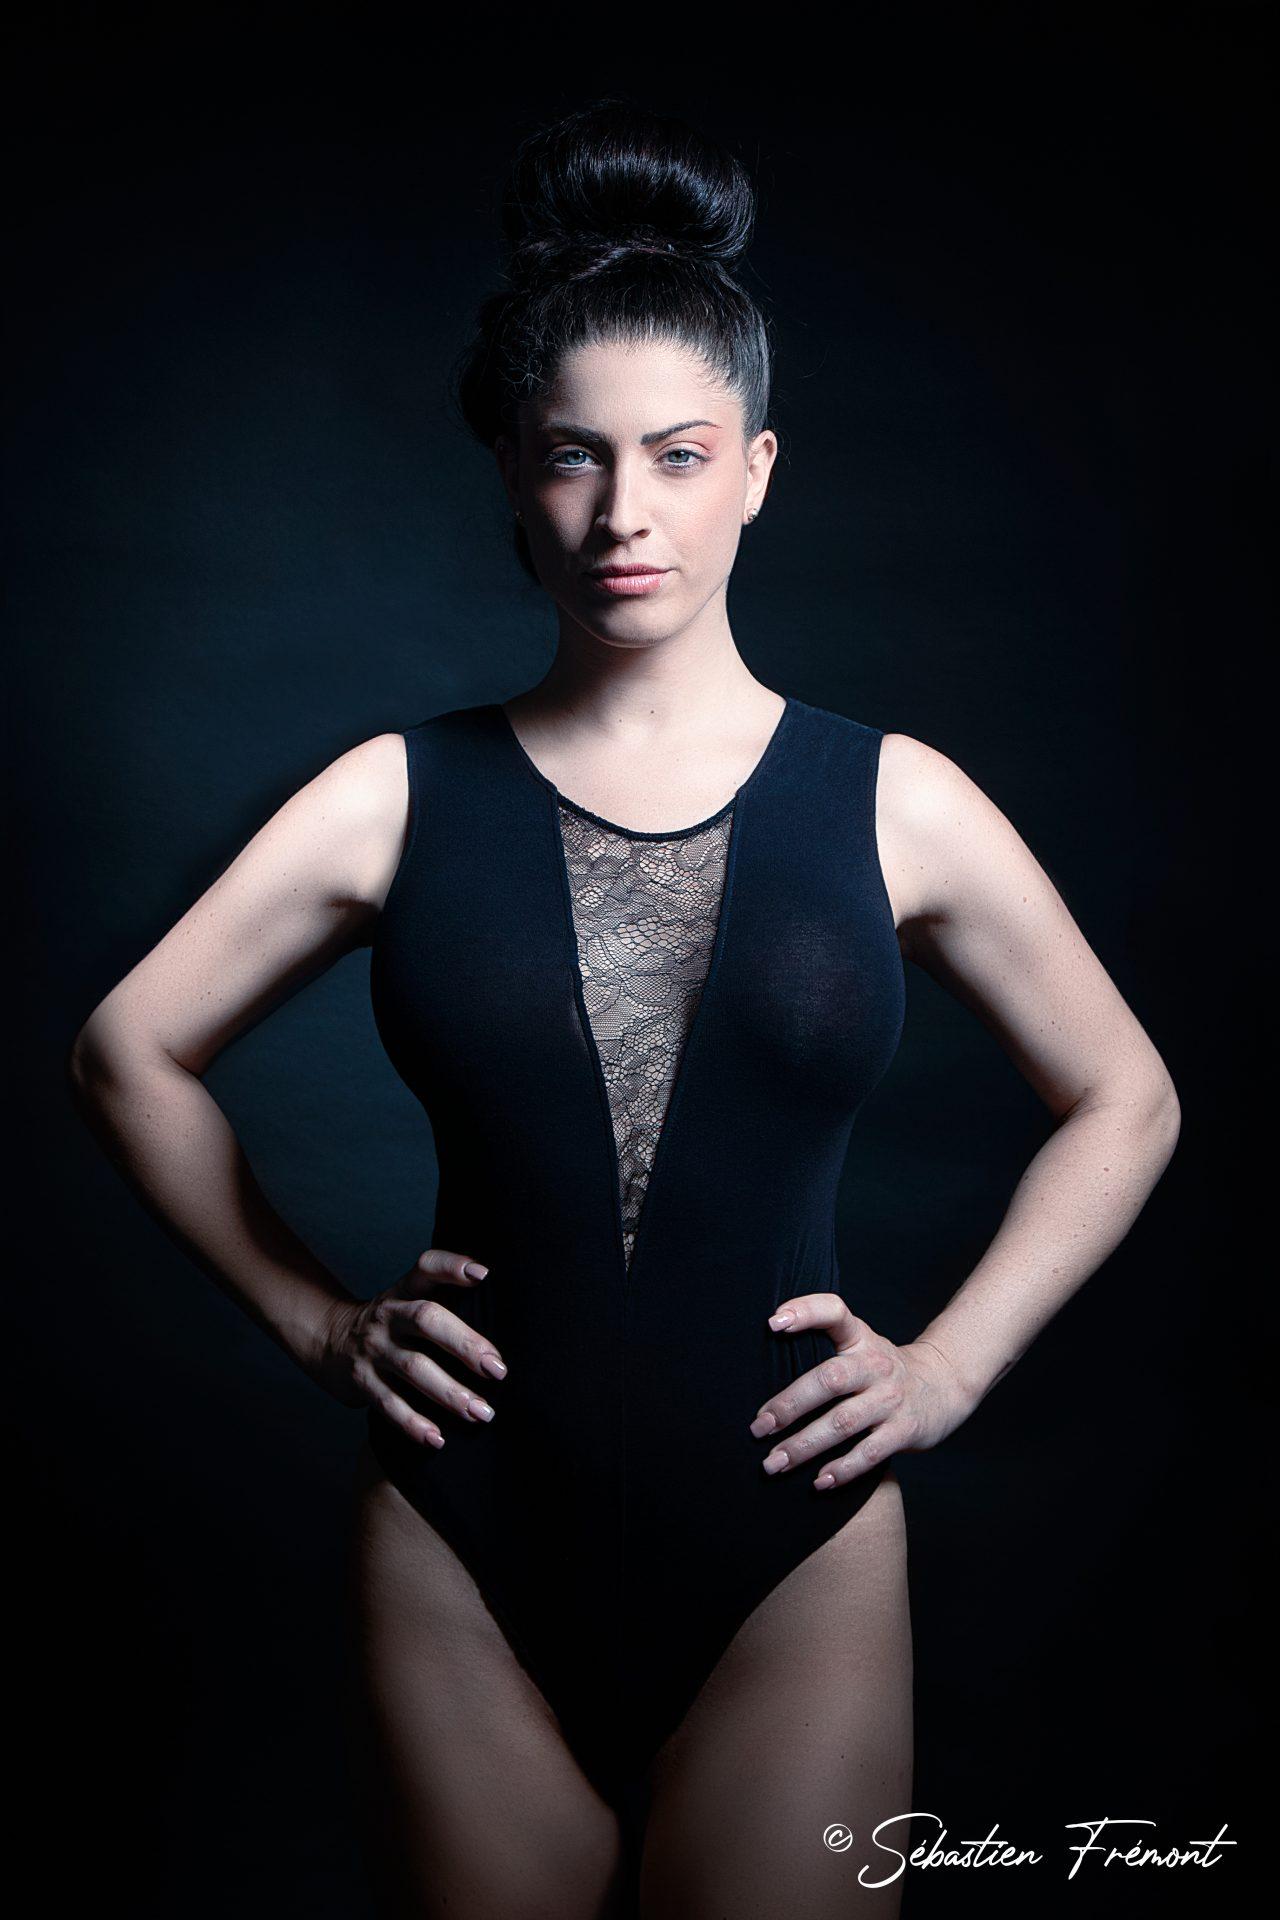 French Photographer Fashion Photography Omolusã / Stella Lyne